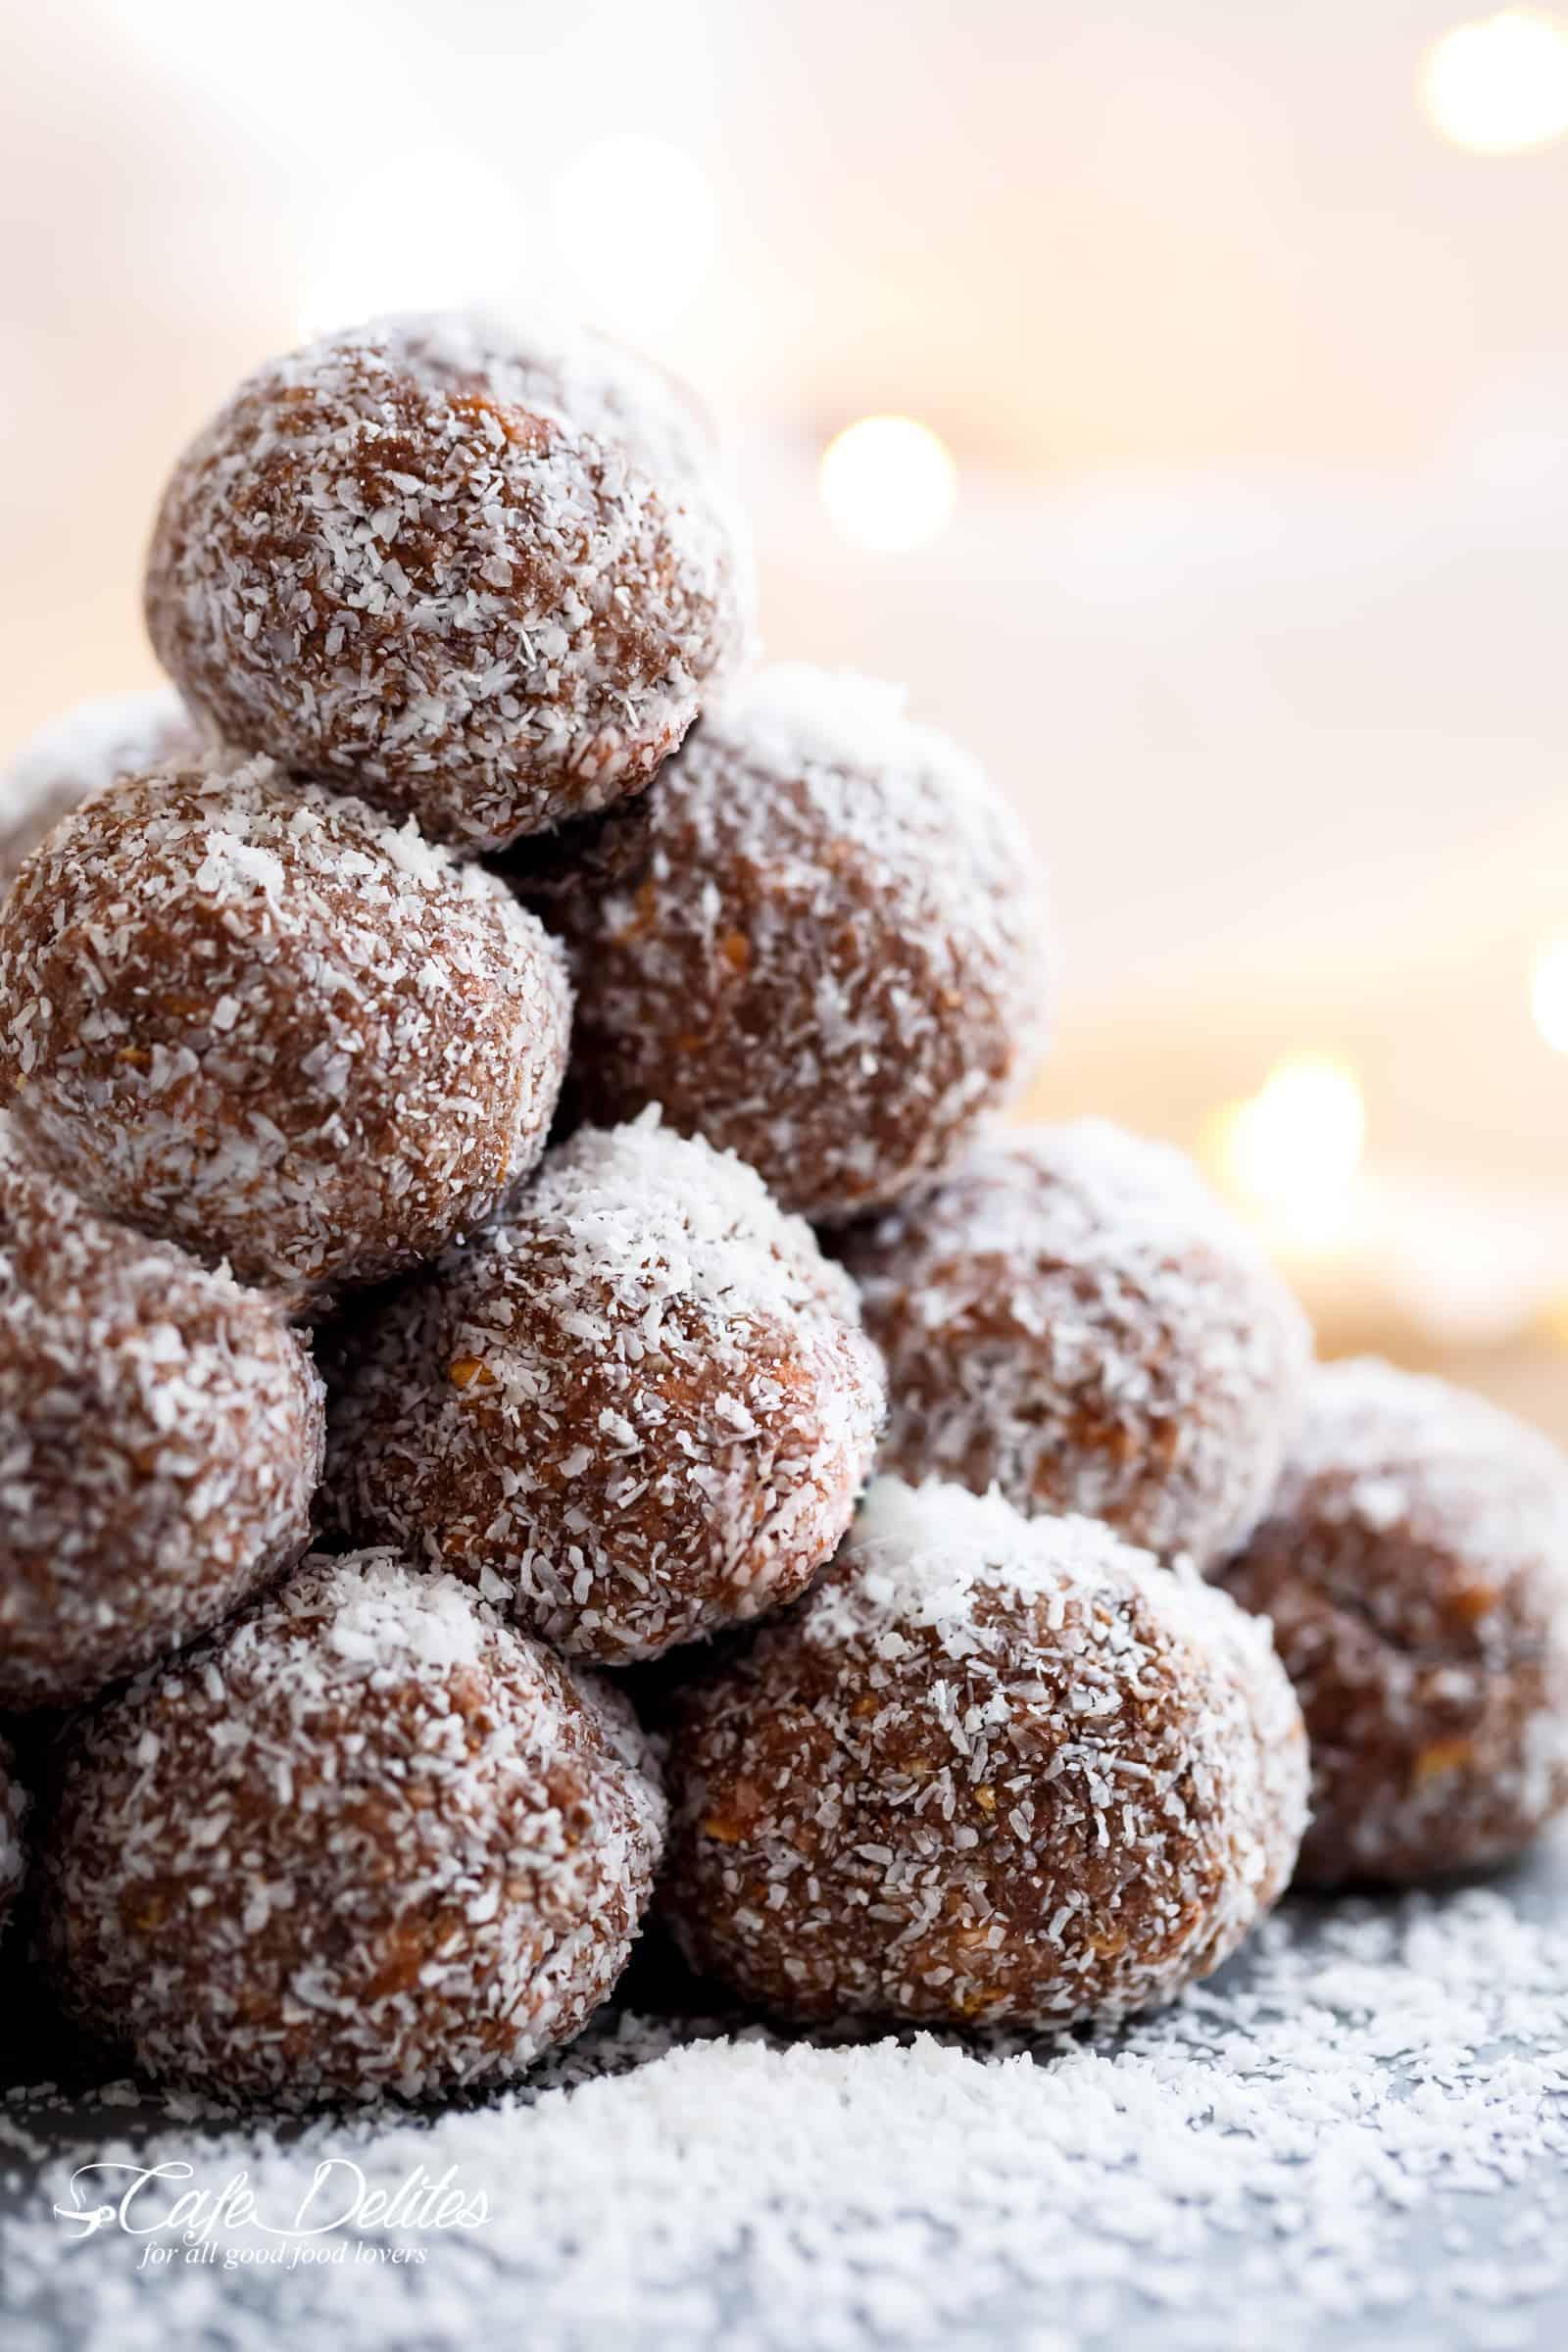 Coconut-Coated Chocolate Rum Balls shacala